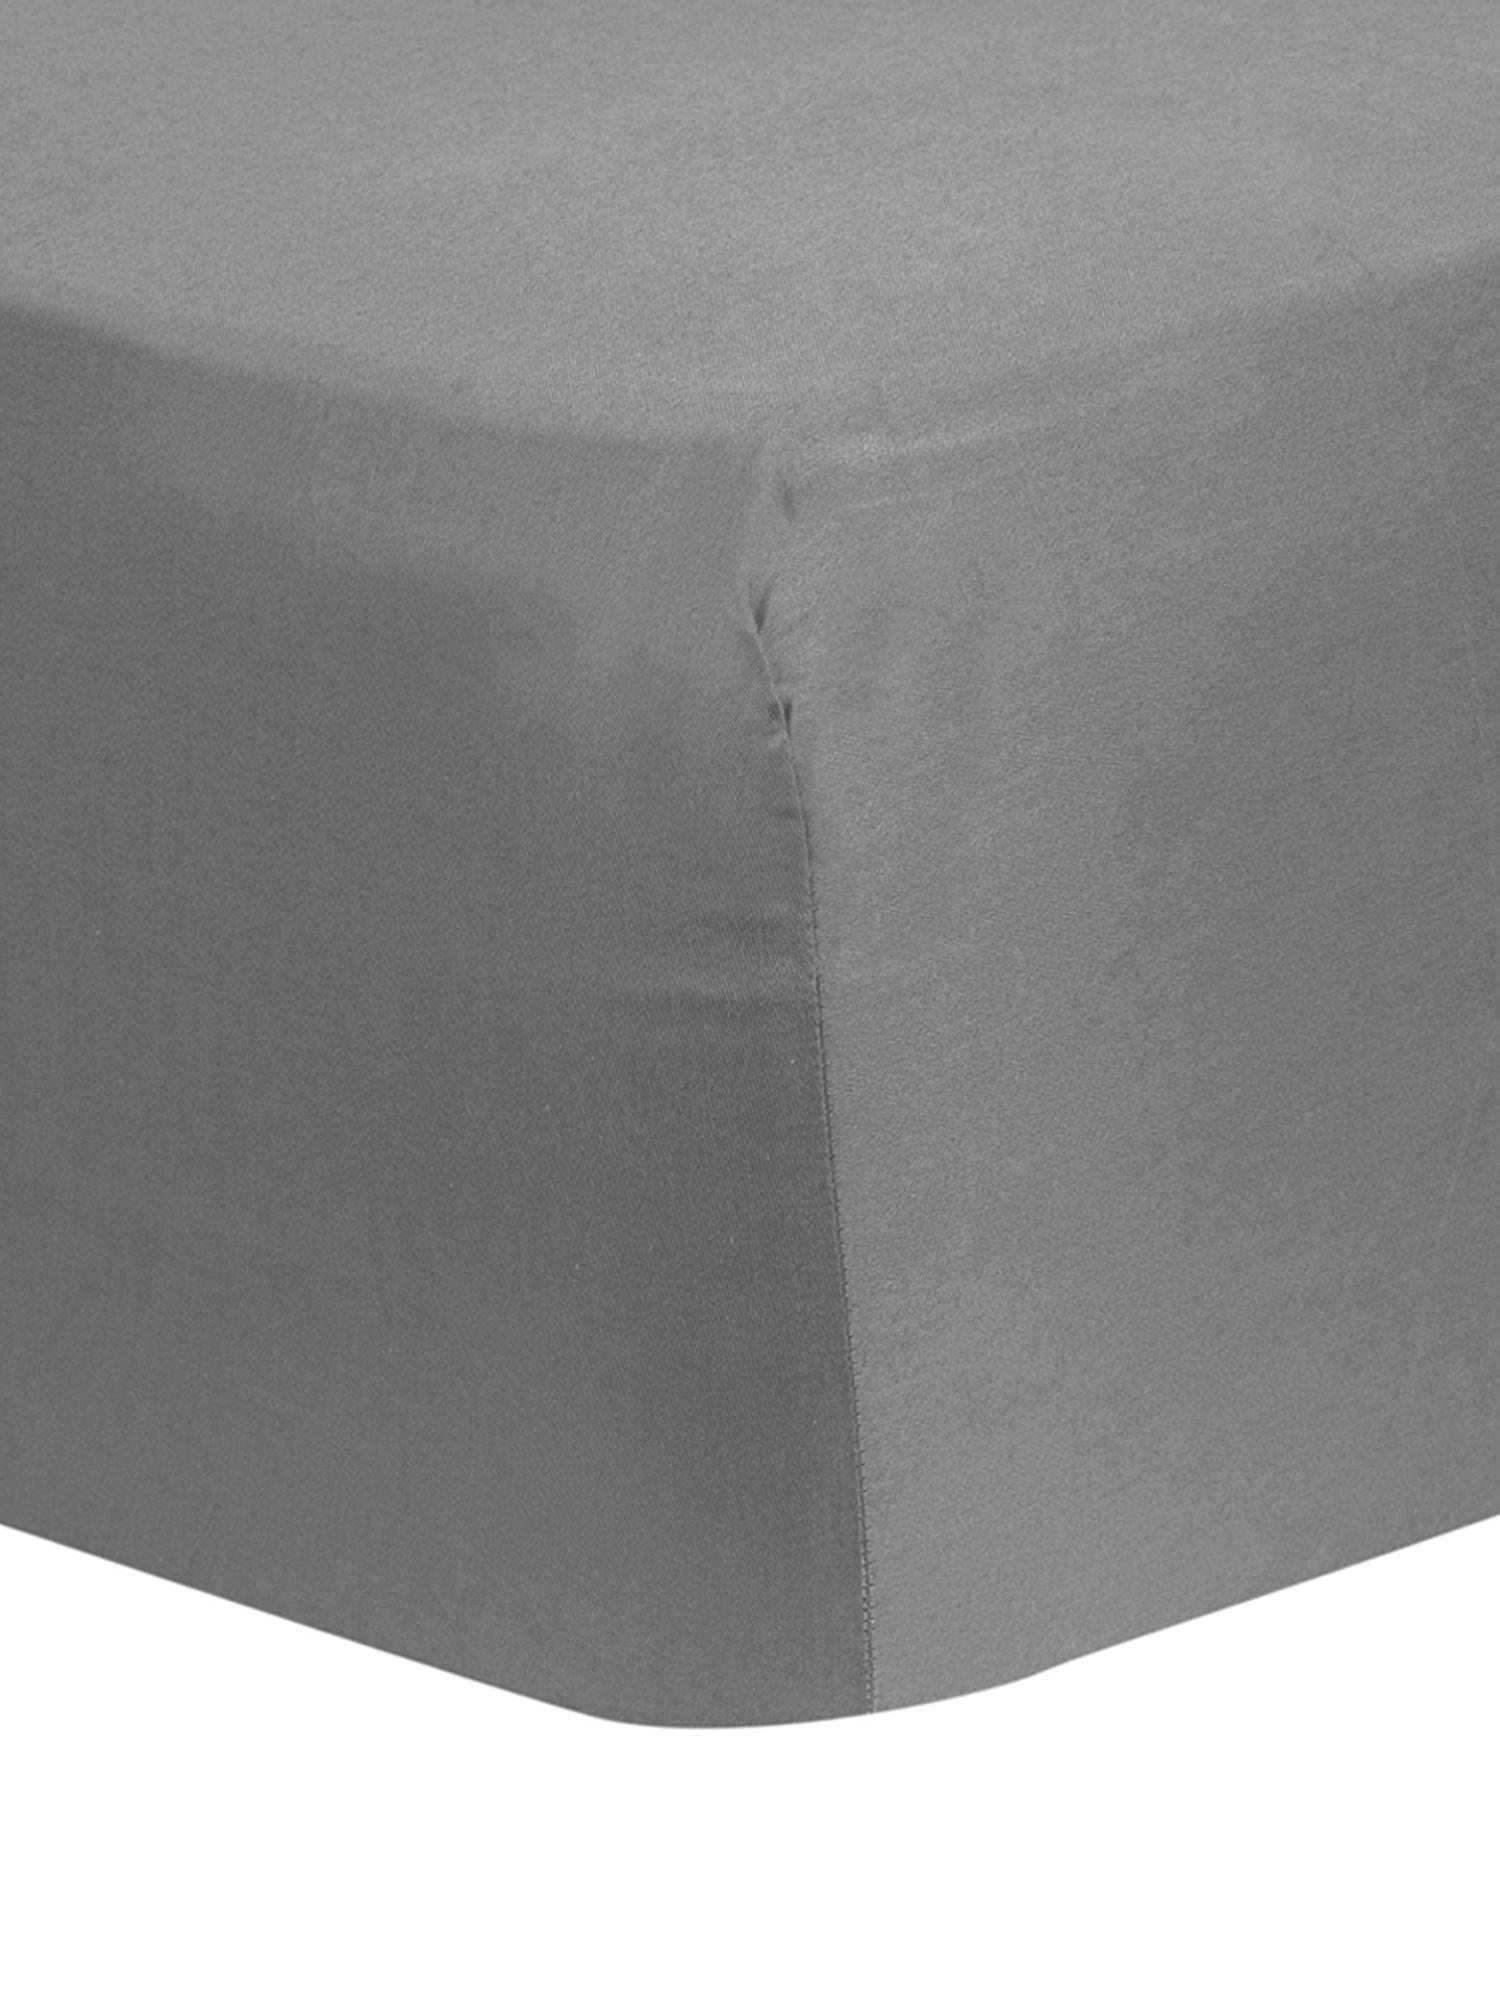 Sábana bajera para boxspring de algodón Comfort, Gris oscuro, Cama 90 cm (90 x 200 cm)